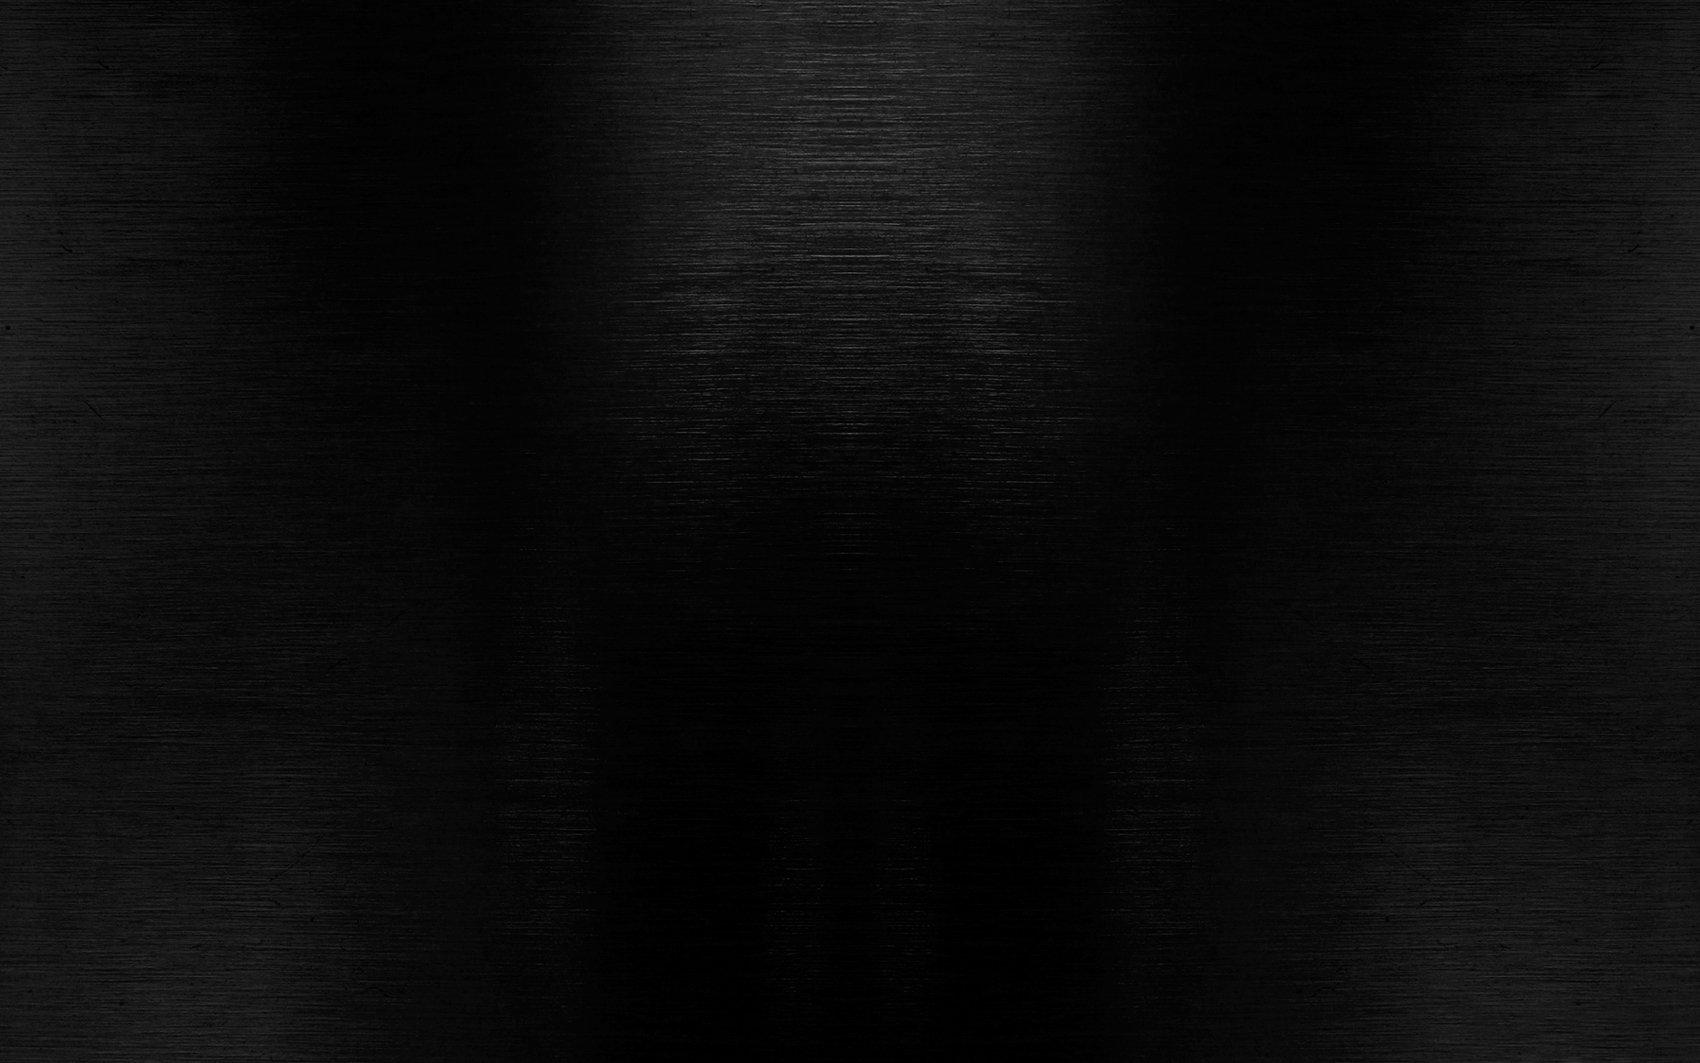 44+] Shiny Black Wallpaper on WallpaperSafari